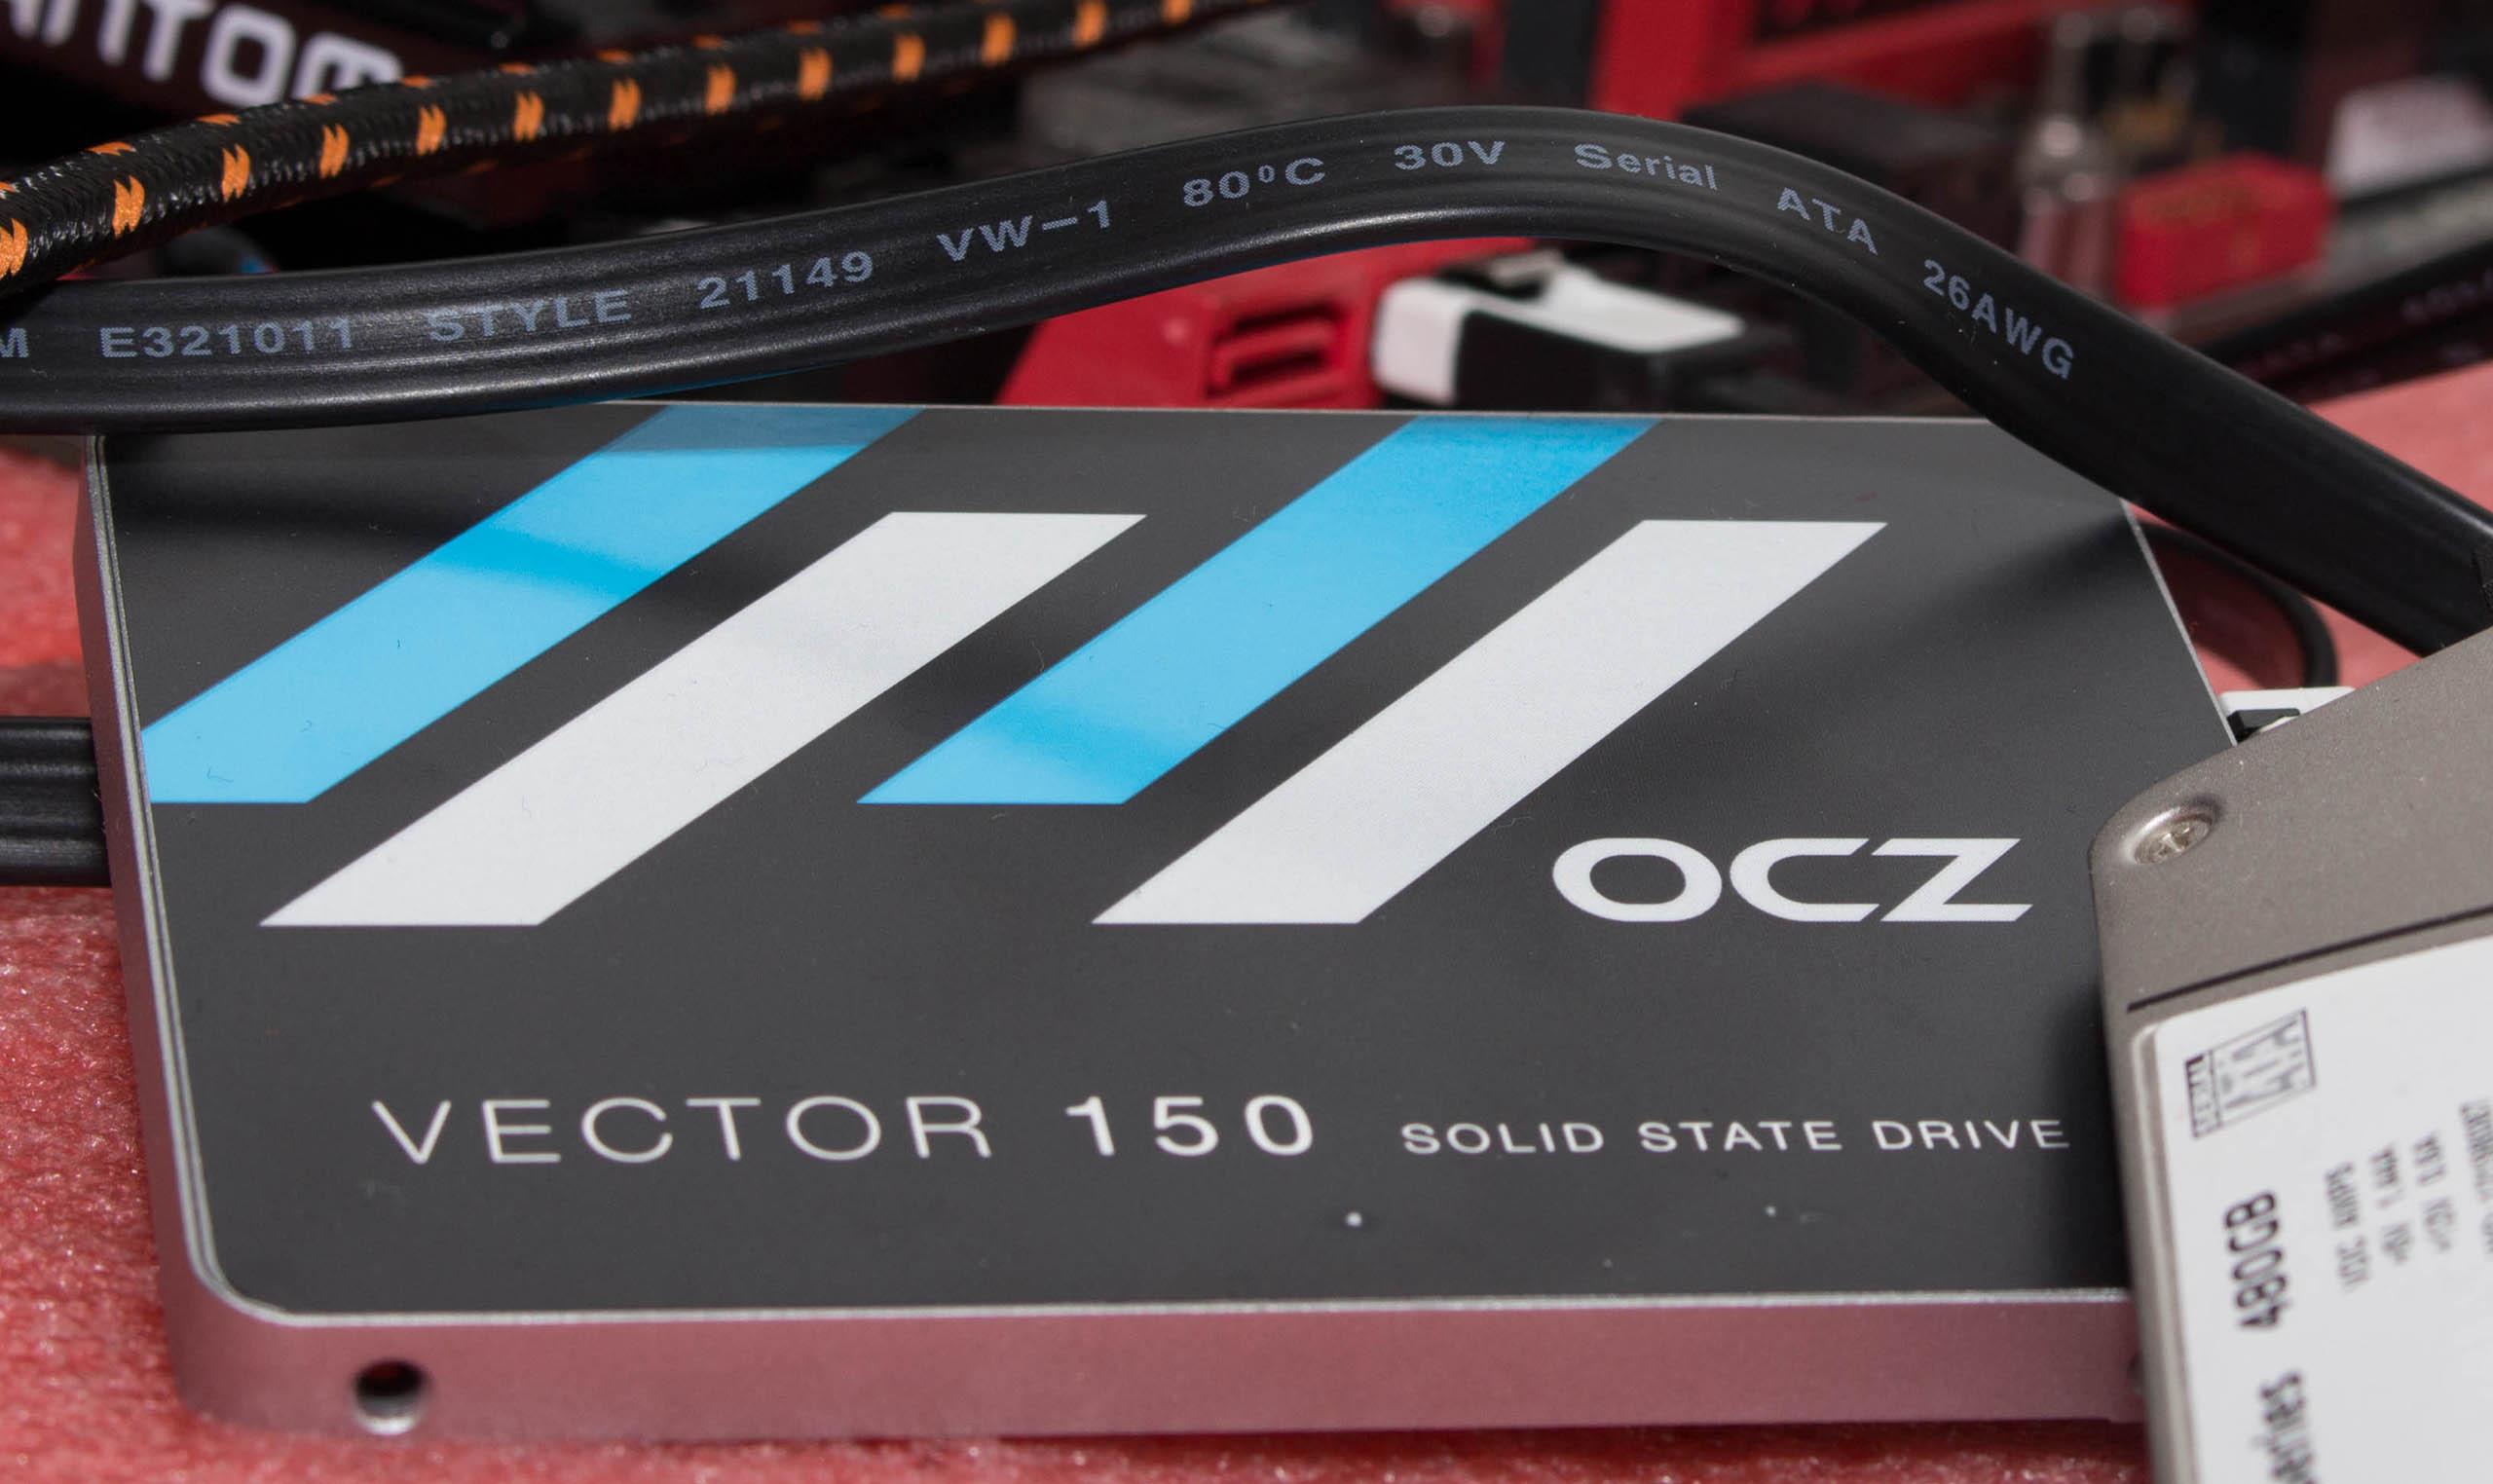 Dnevnik izdržljivosti SSD-a – OCZ Vector 150 240GB @ 40TB